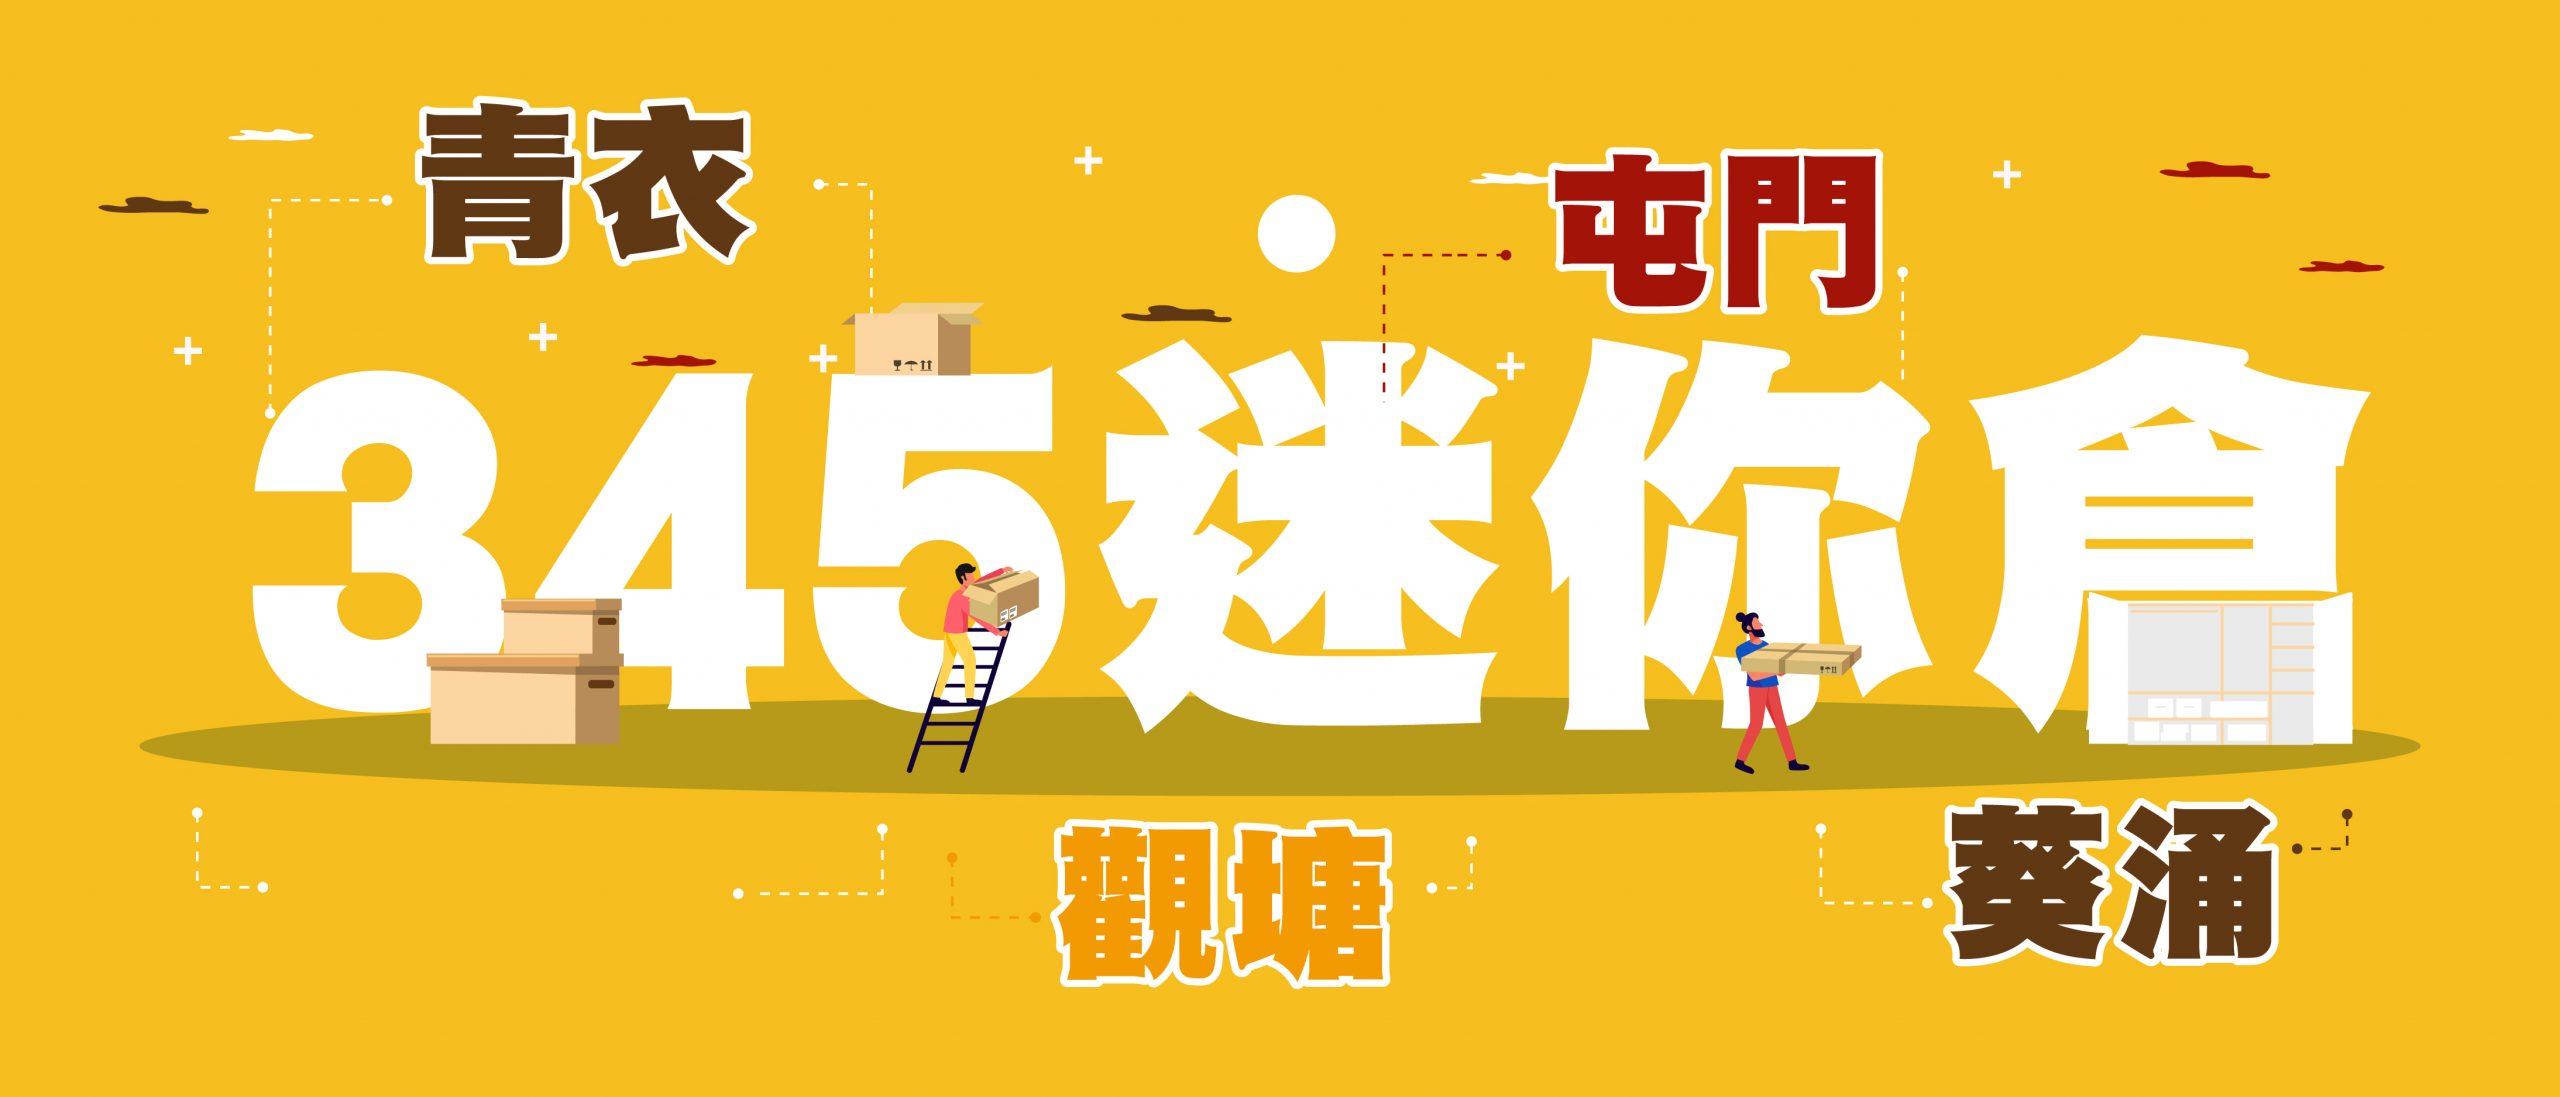 345web banner-01